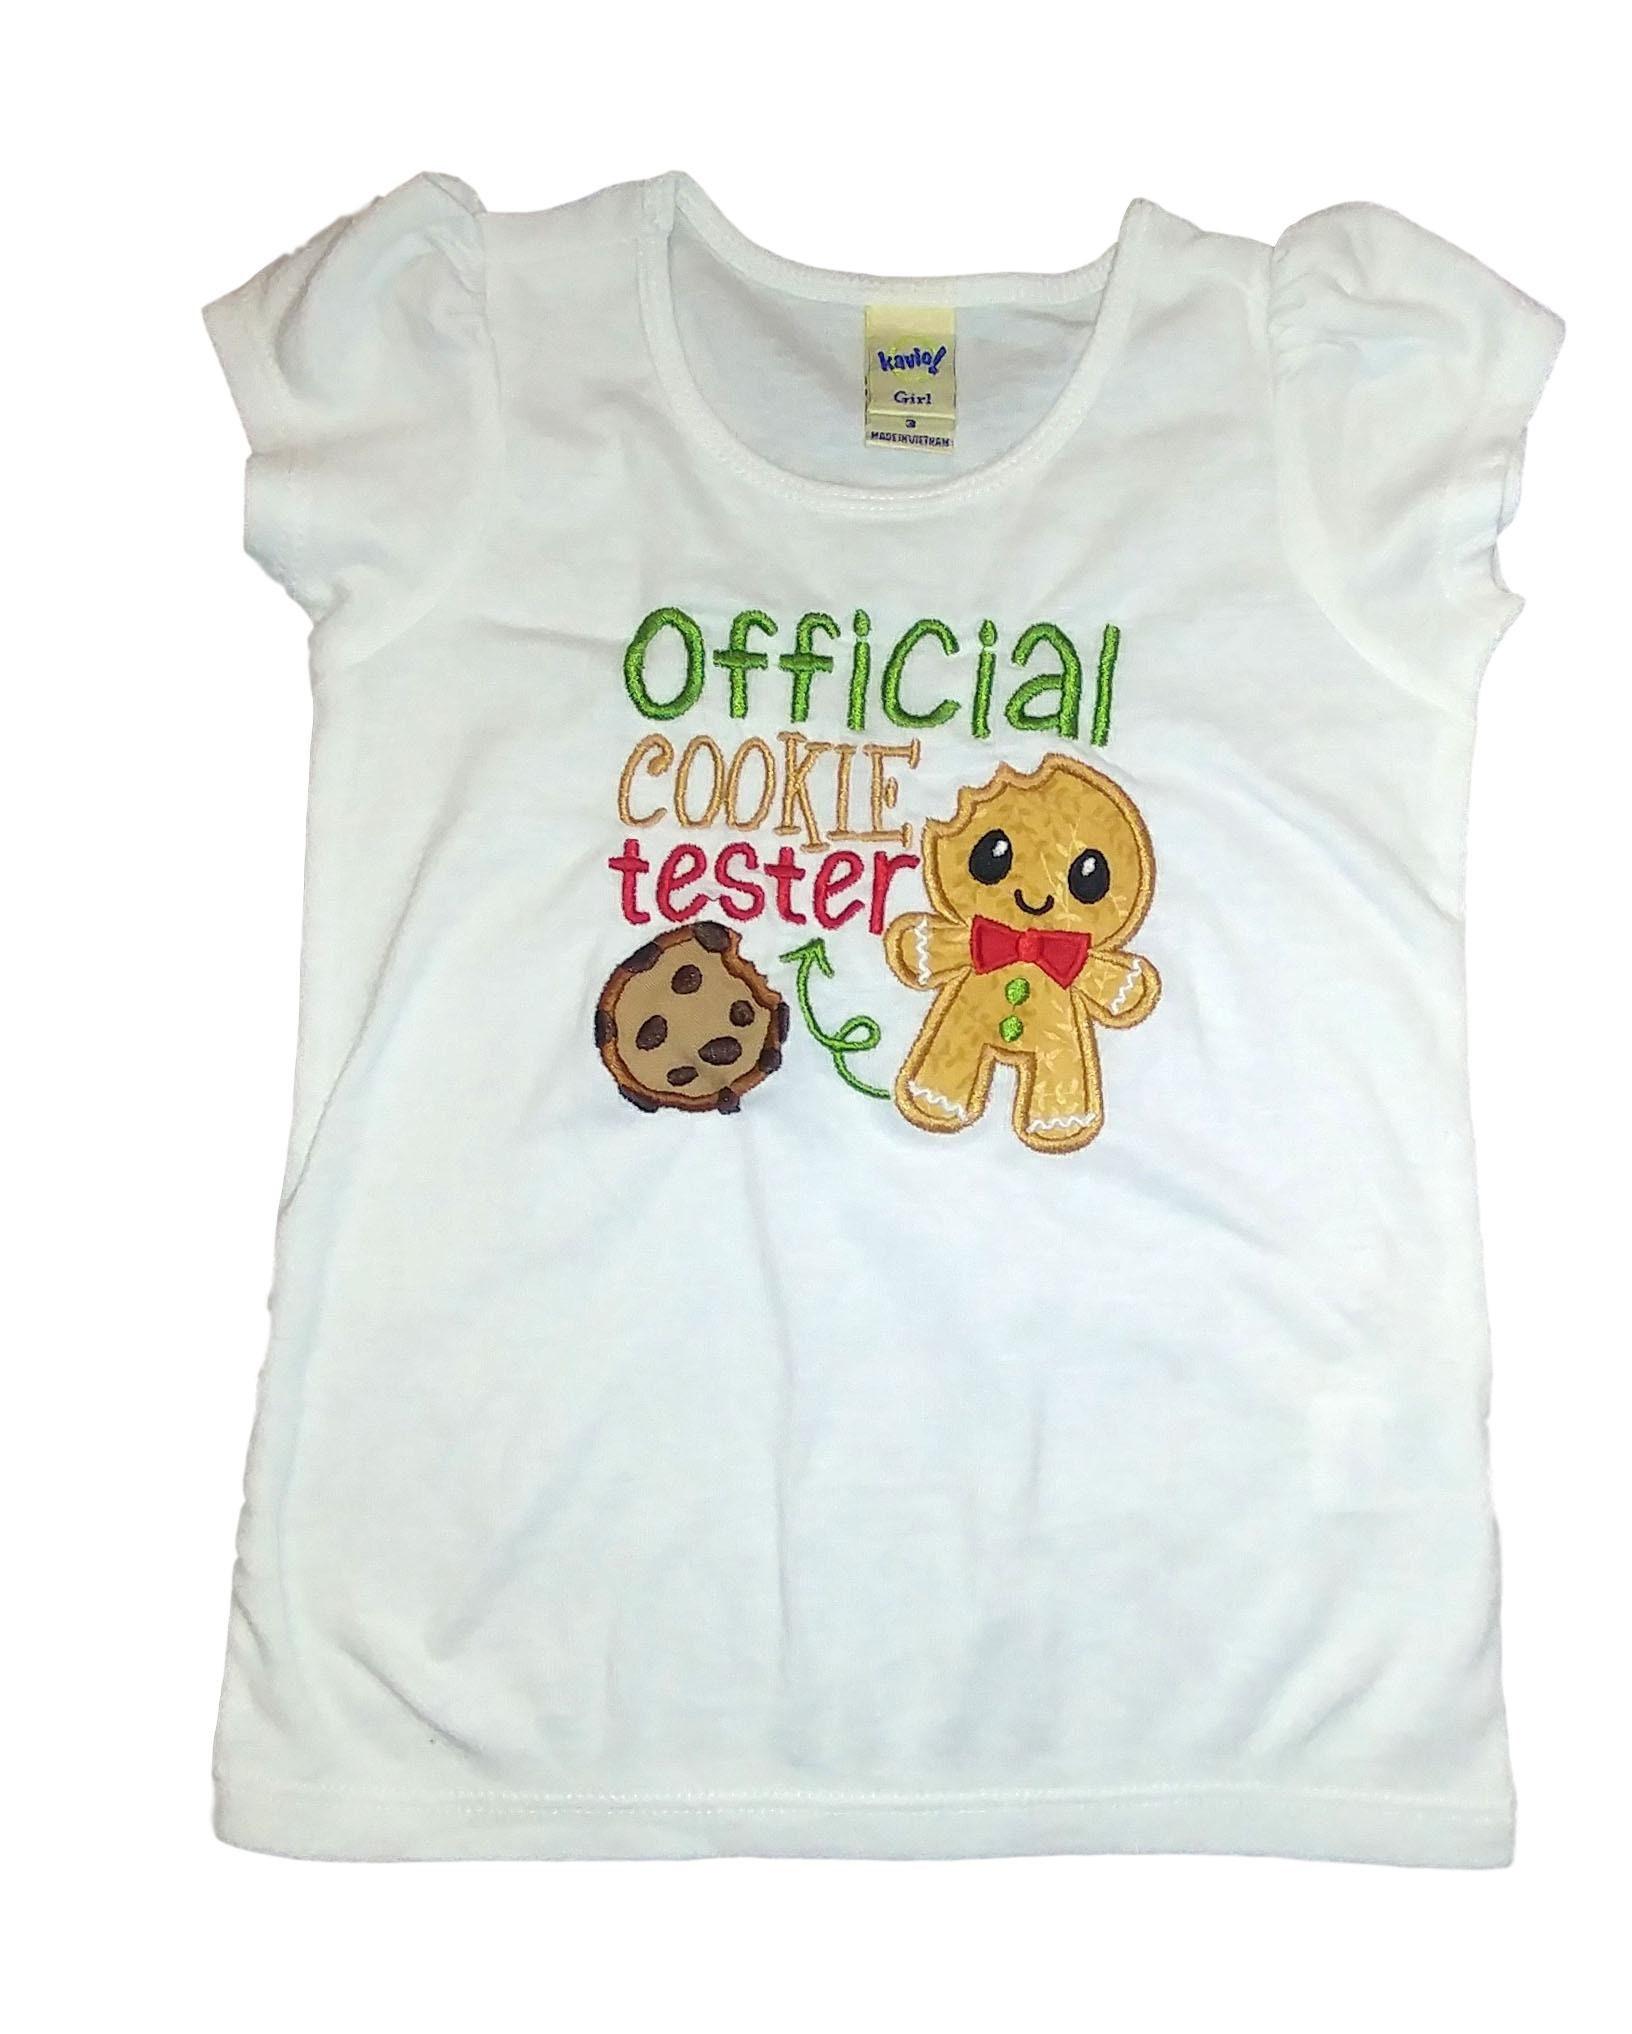 girl christmas shirt girl fall shirt girl shirts girls winter shirt girls shirts - Christmas Shirts For Girls